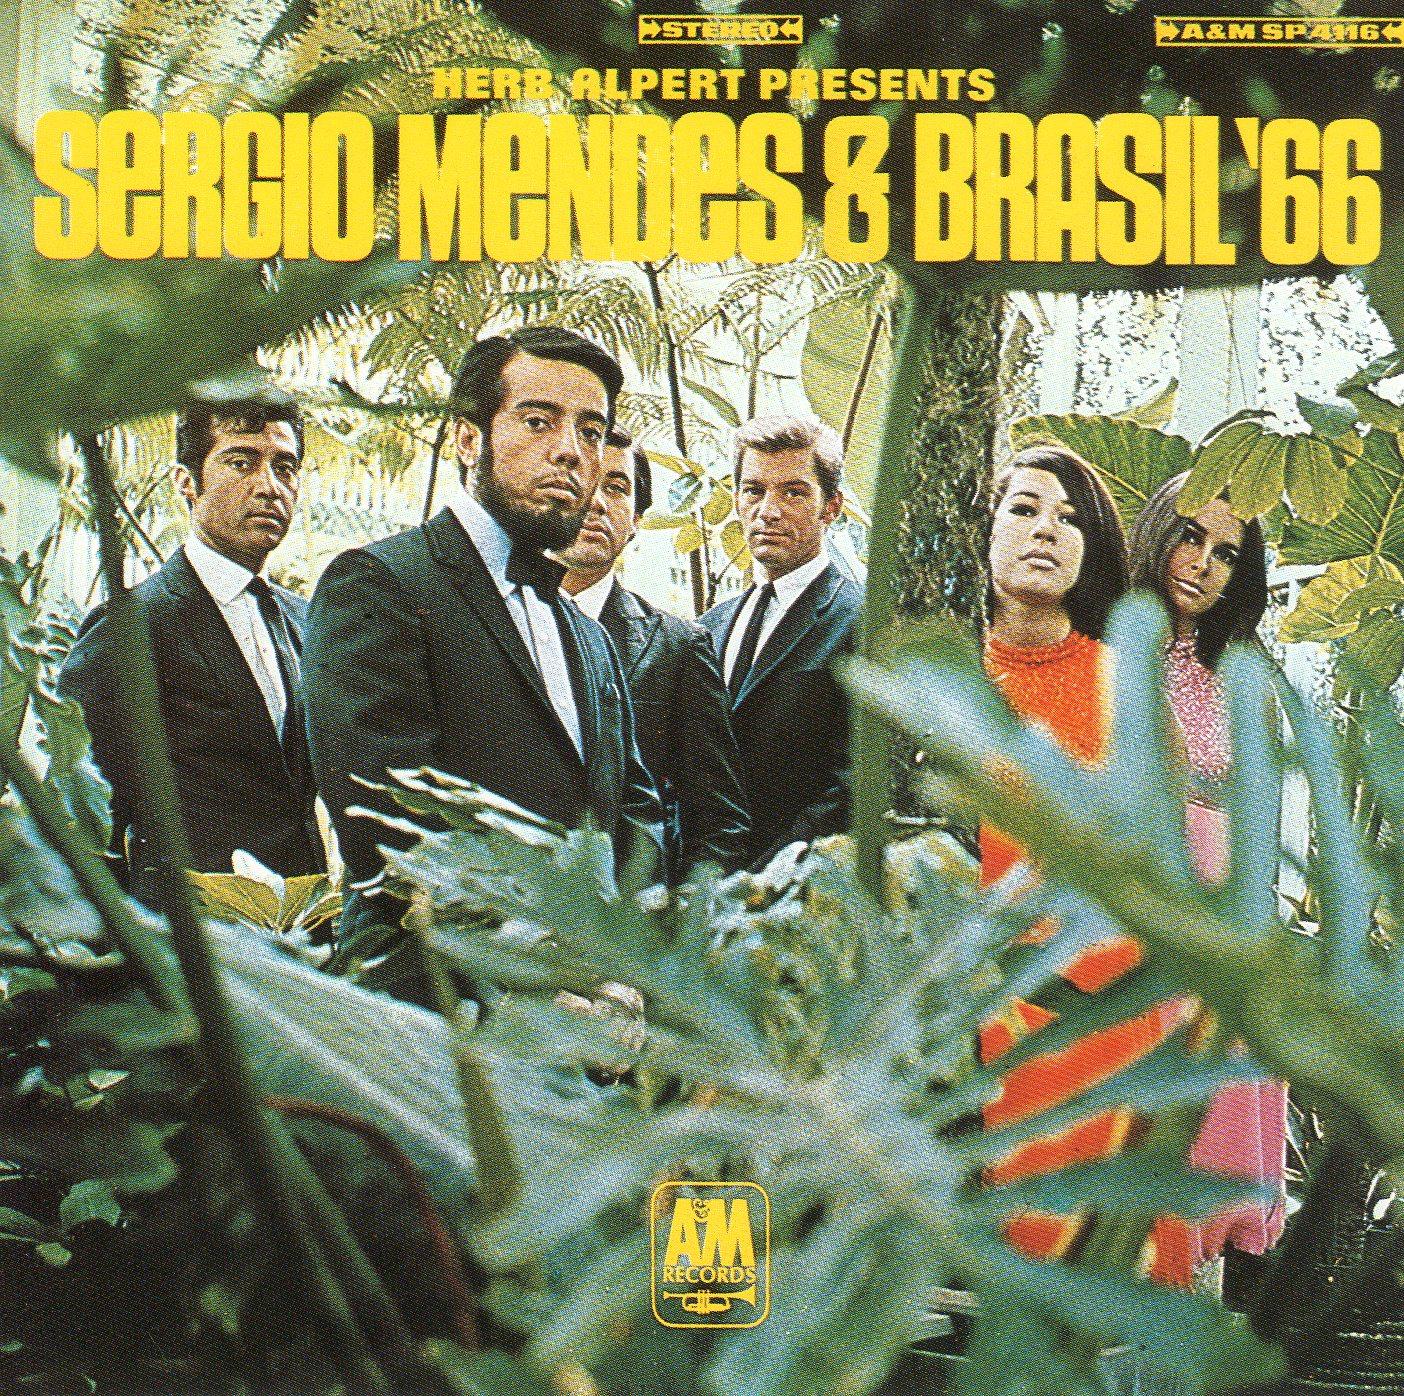 CD3811_SERGIO_MENDES_AND_BRASIL_66-HERB_ALPERT_PRESENTS_SERGIO_MENDES_AND_BRASIL_66-front